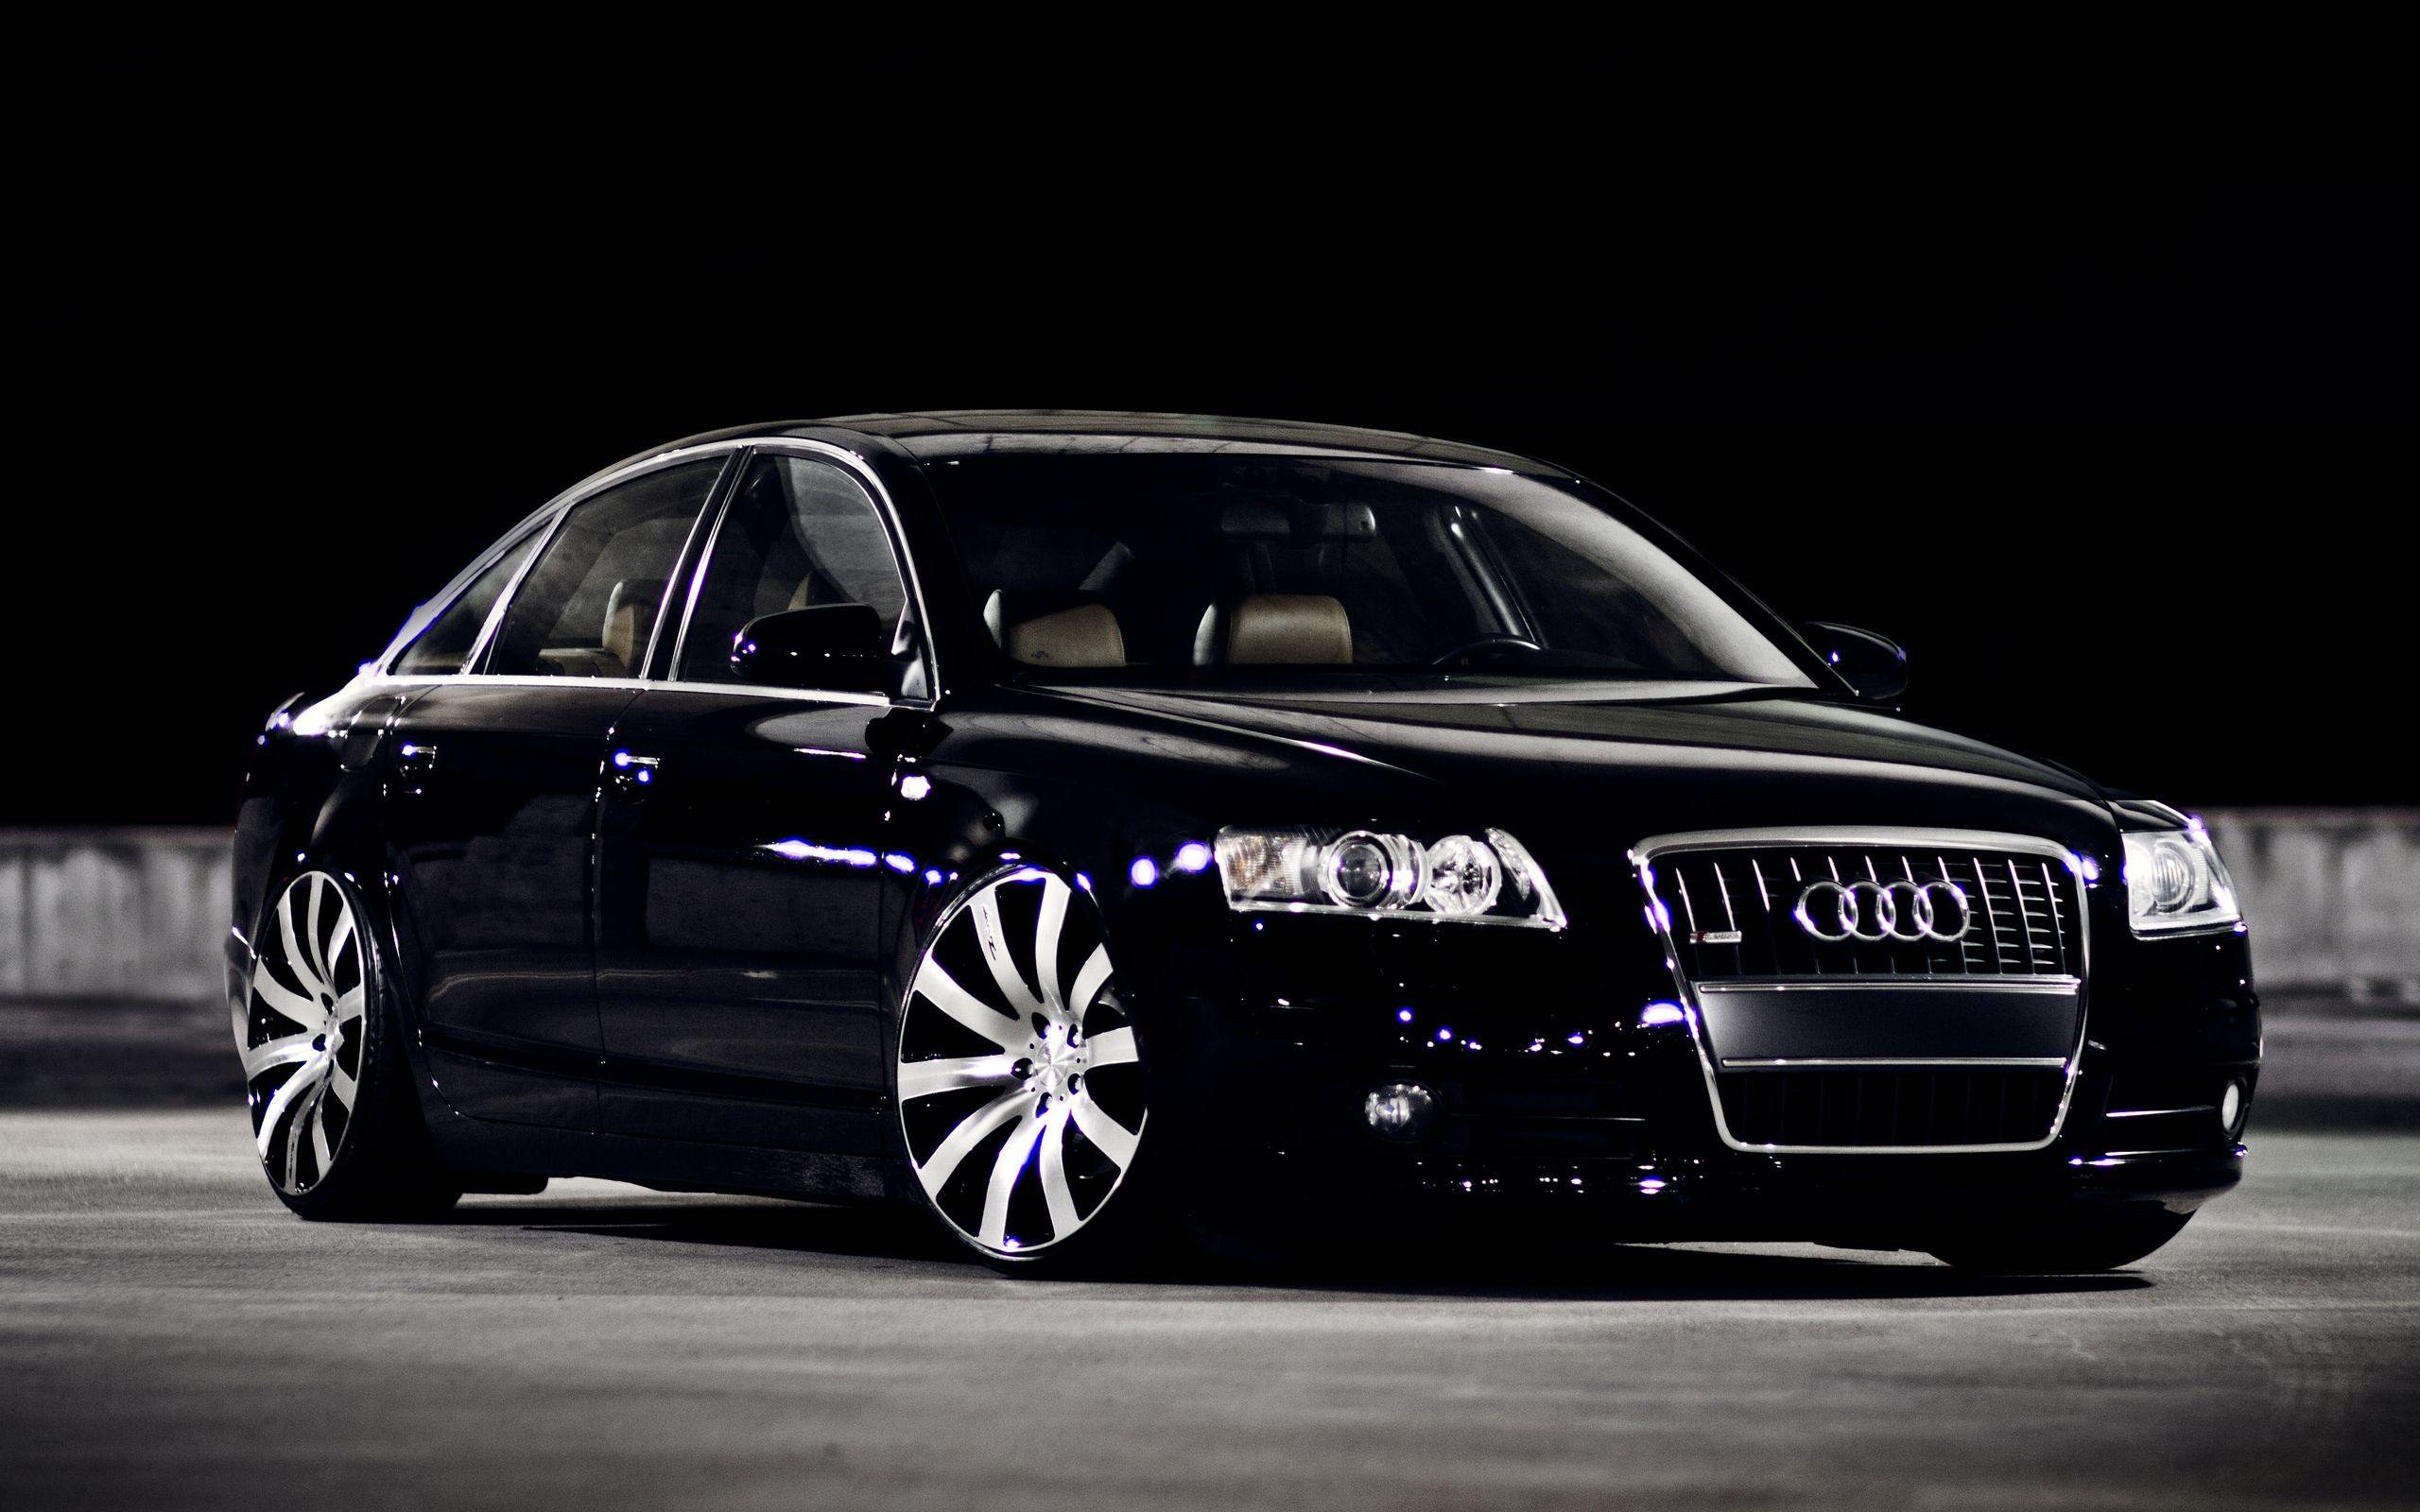 Cool Hd Audi Wallpapers For Free Download Black Audi Audi Cars Audi A6